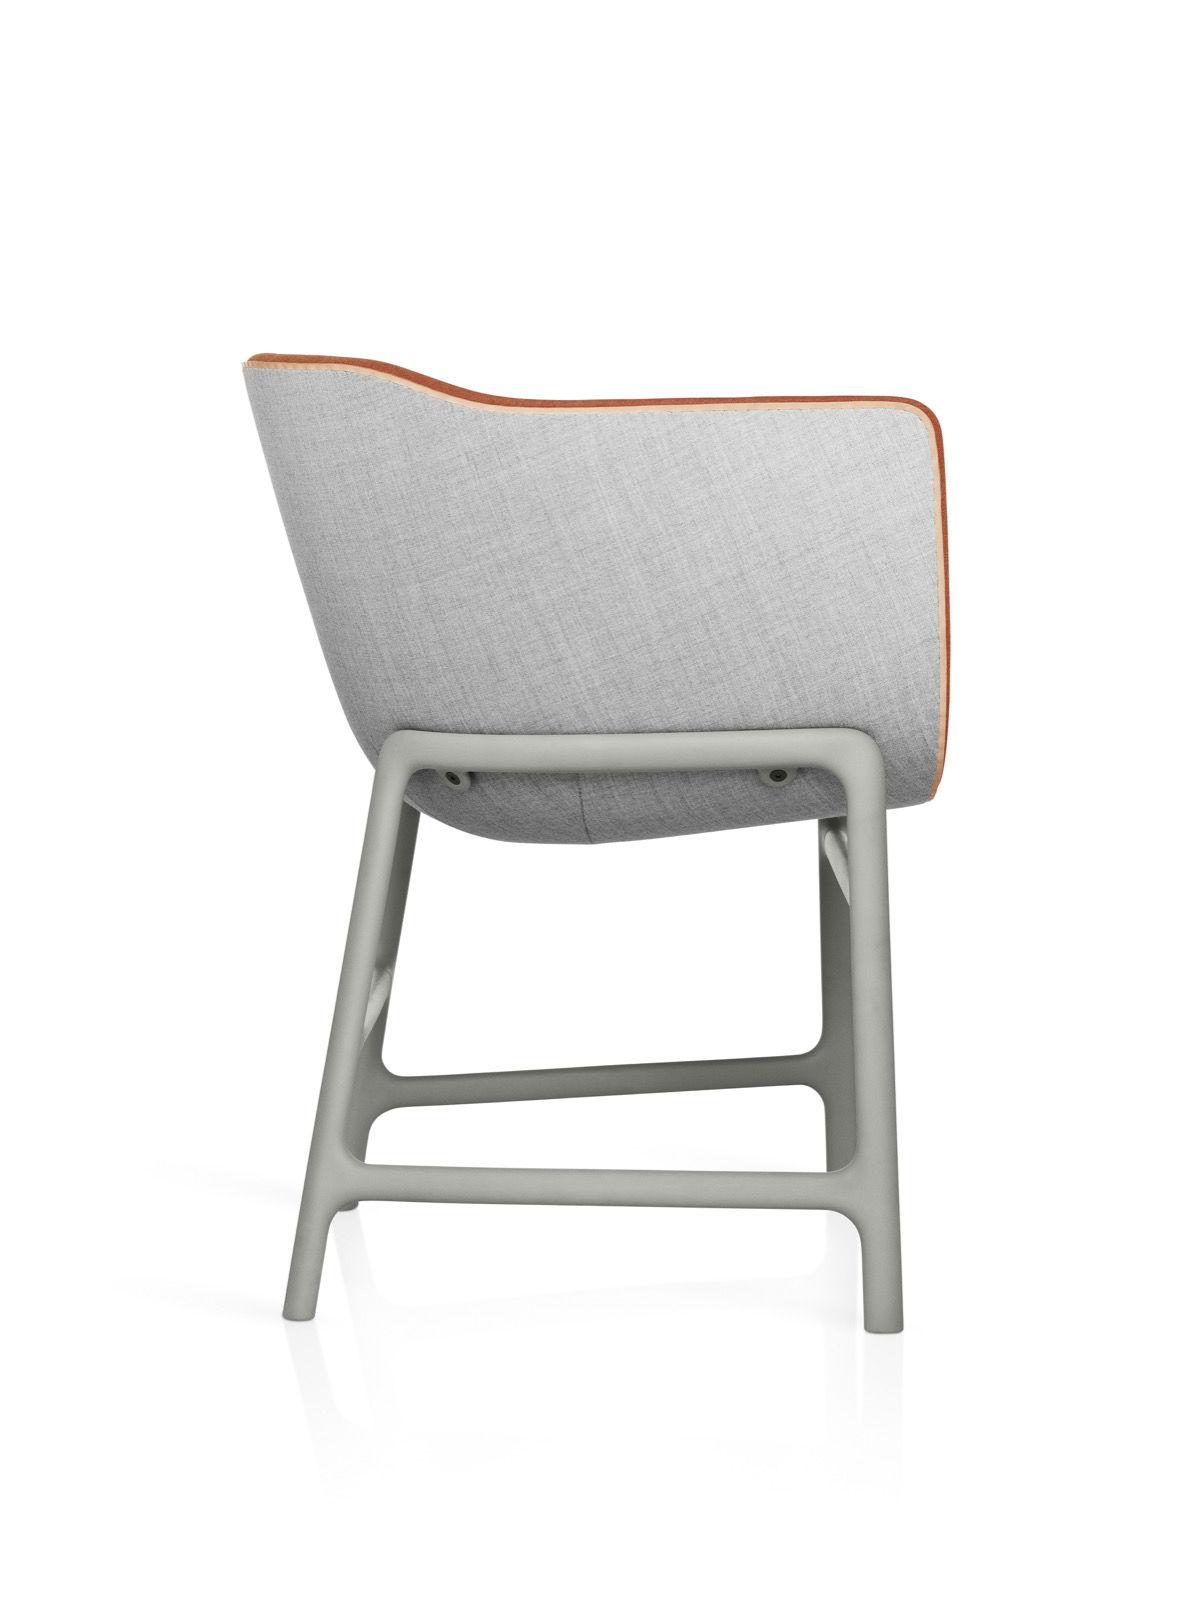 Fritz hansen miniscule fauteuil matser for Kuipstoel fauteuil